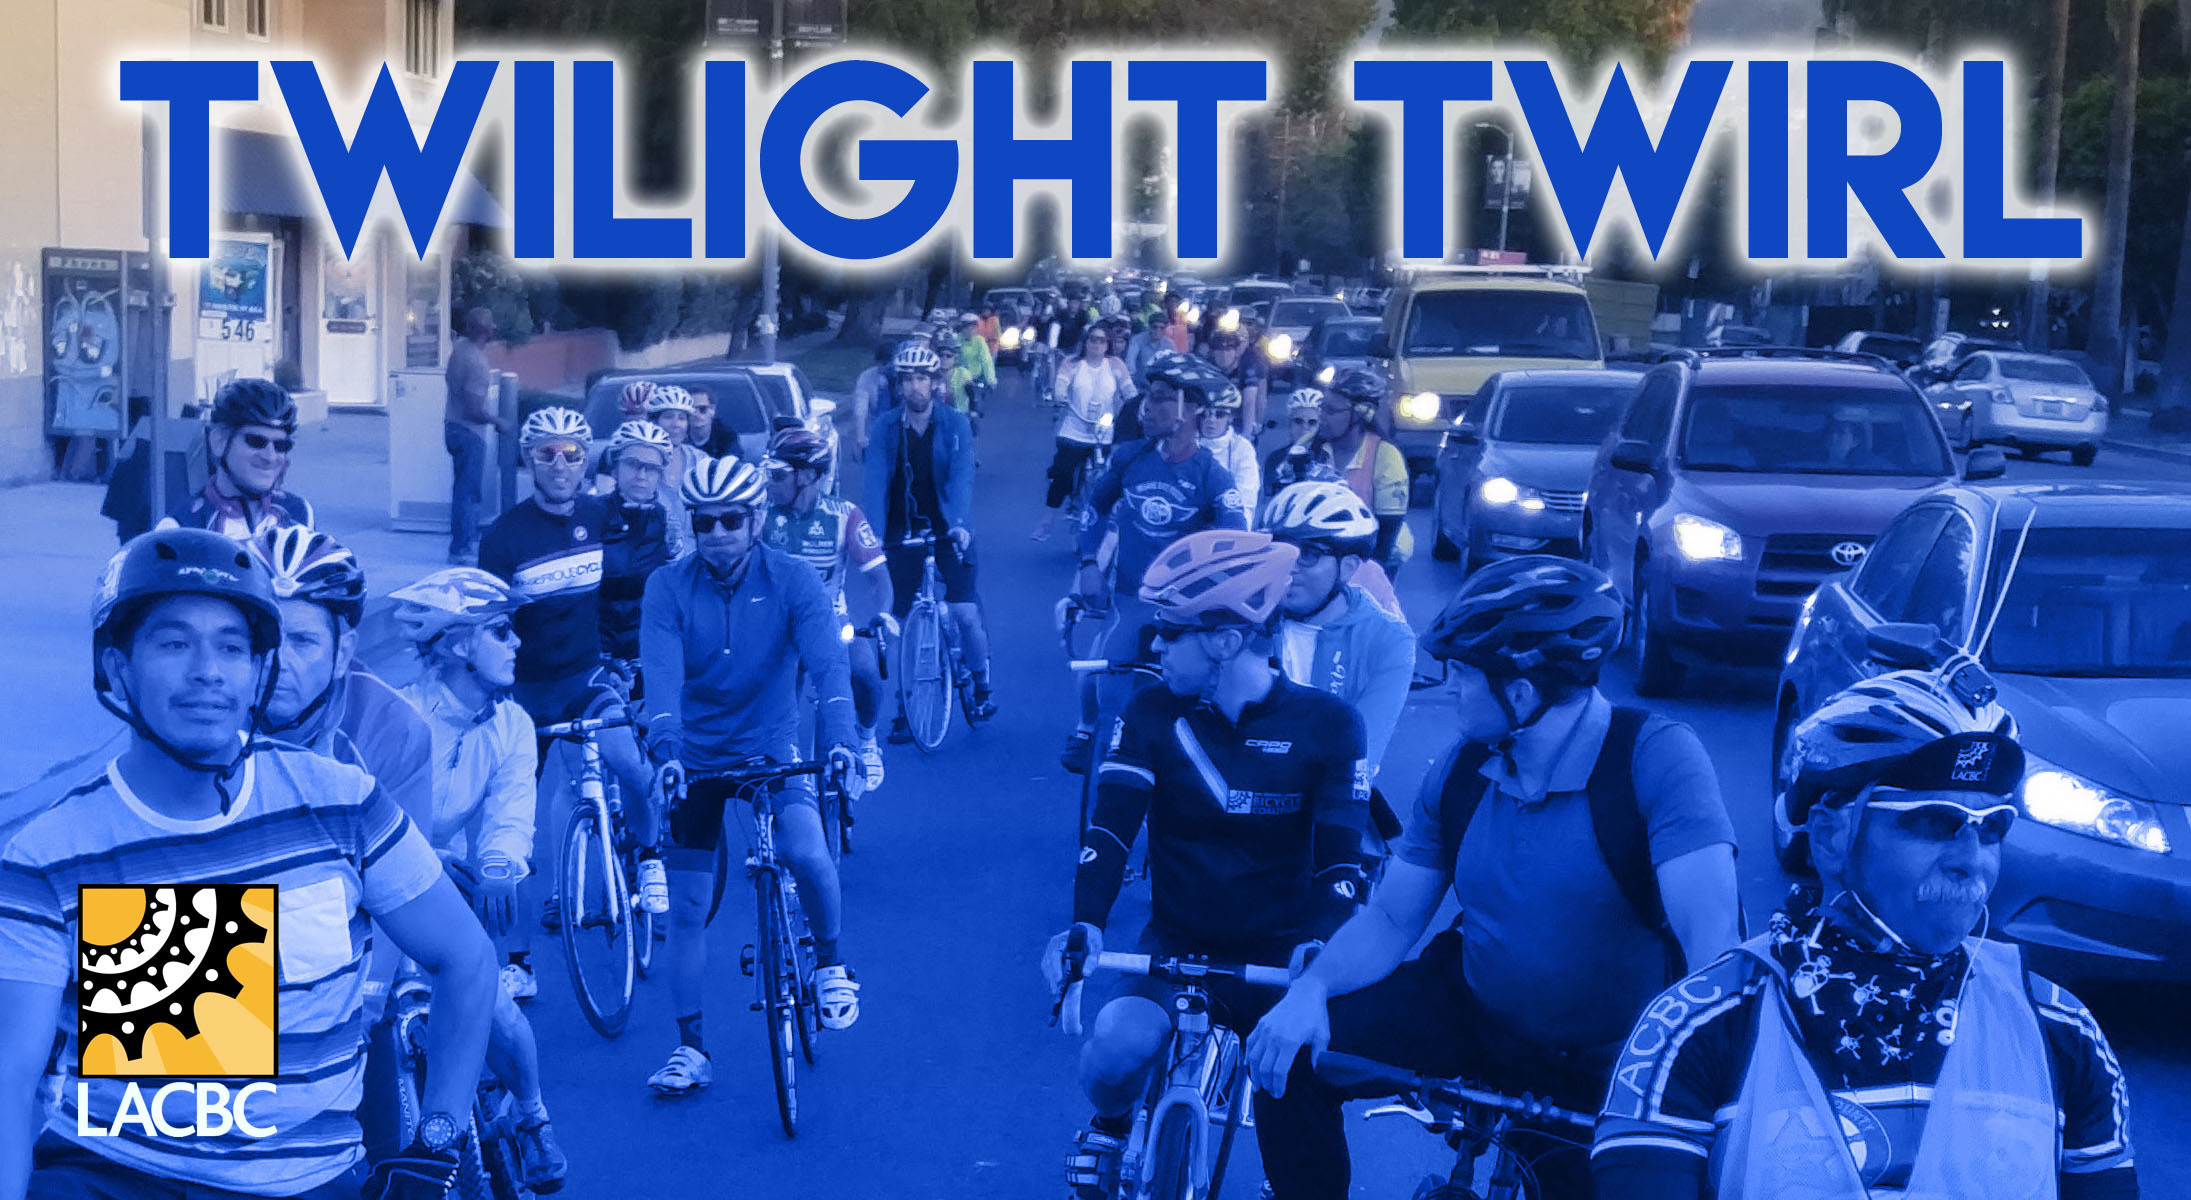 TwilightTwirl_(1).jpg